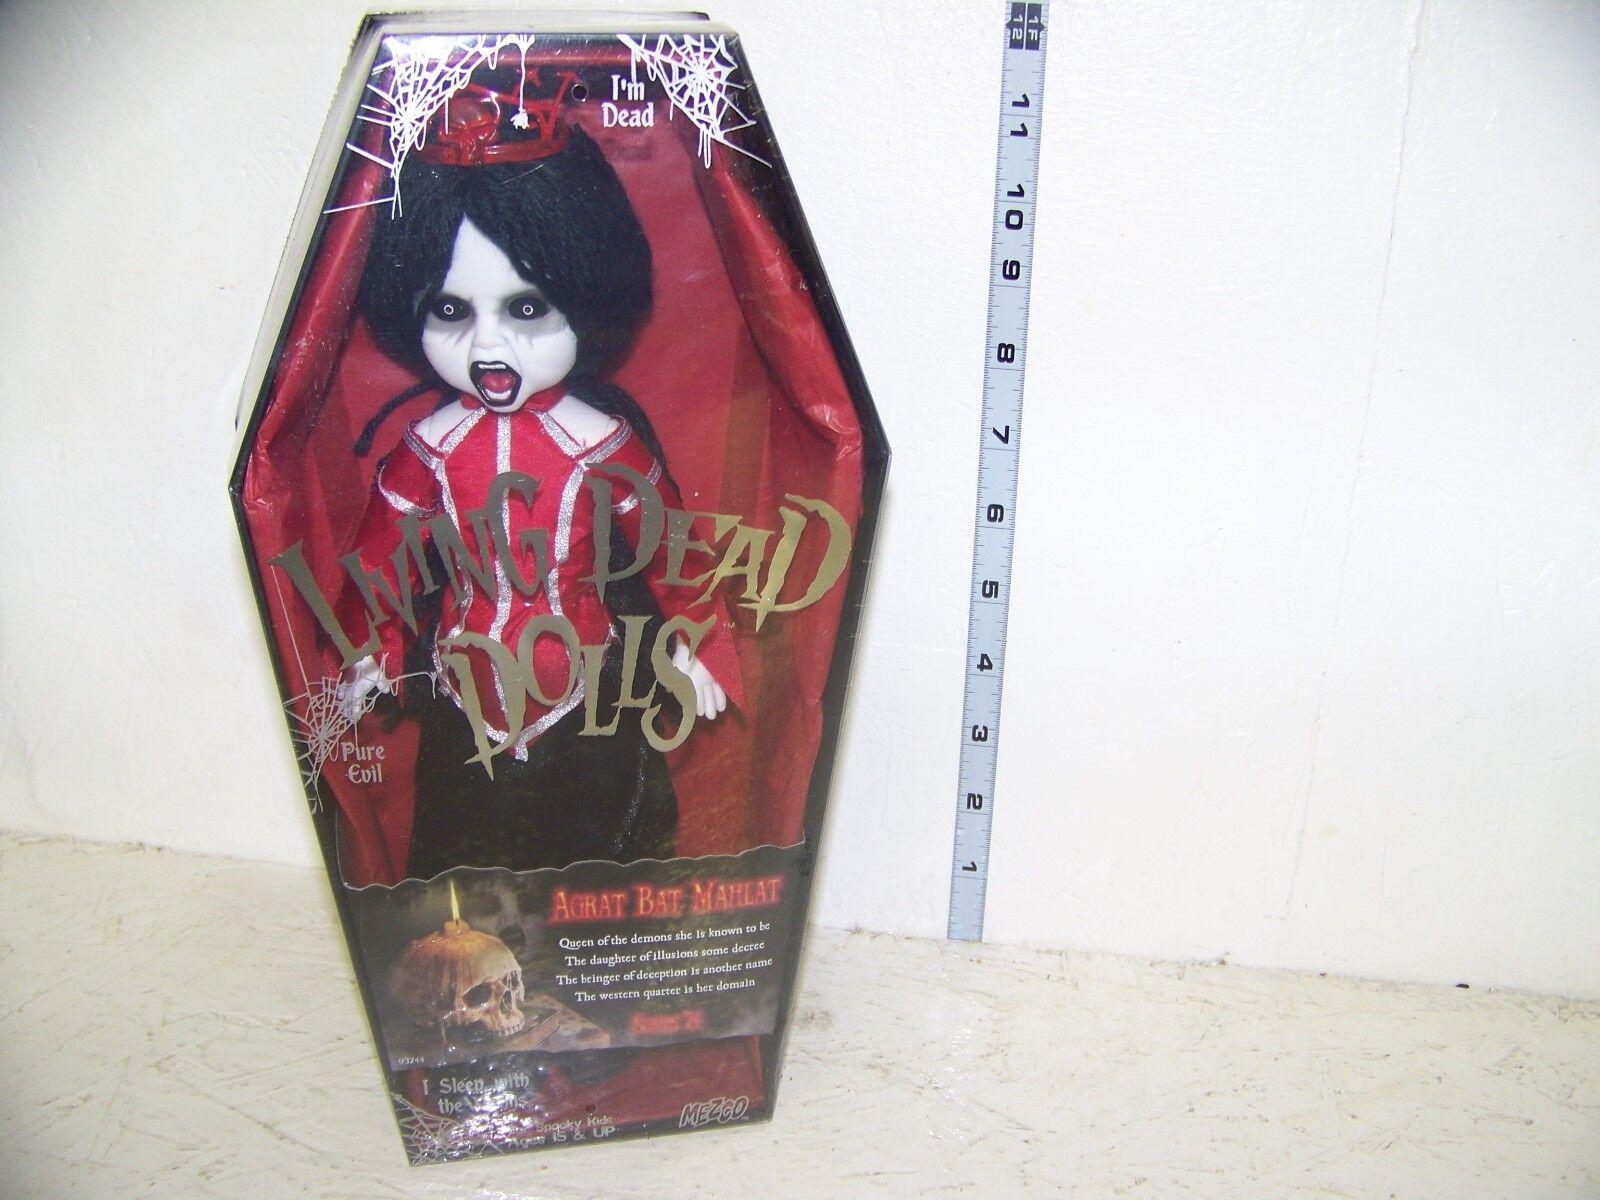 Mezco Living Dead Dolls  Agrat Bat Mailat  Figure Full Size